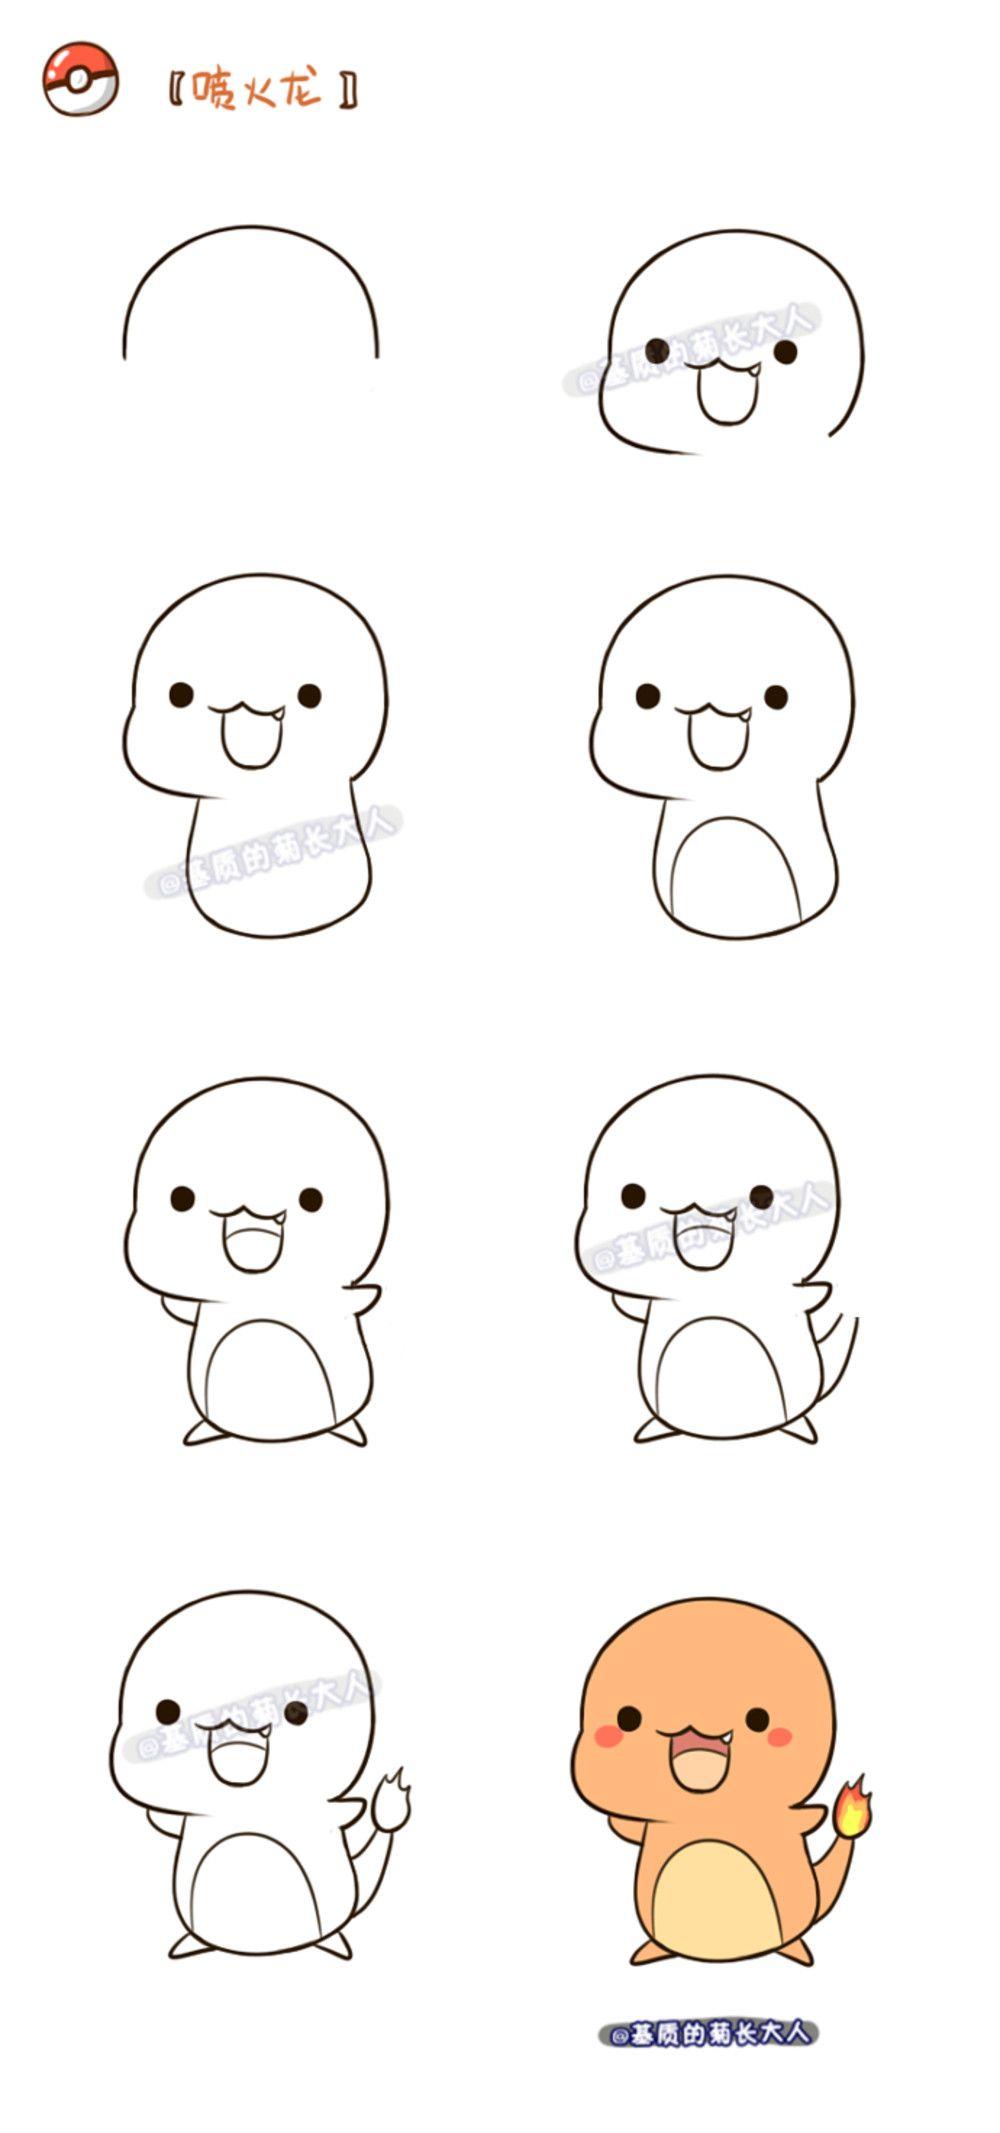 How To Draw Charmander Dessin Pokemon Art Dessin Et